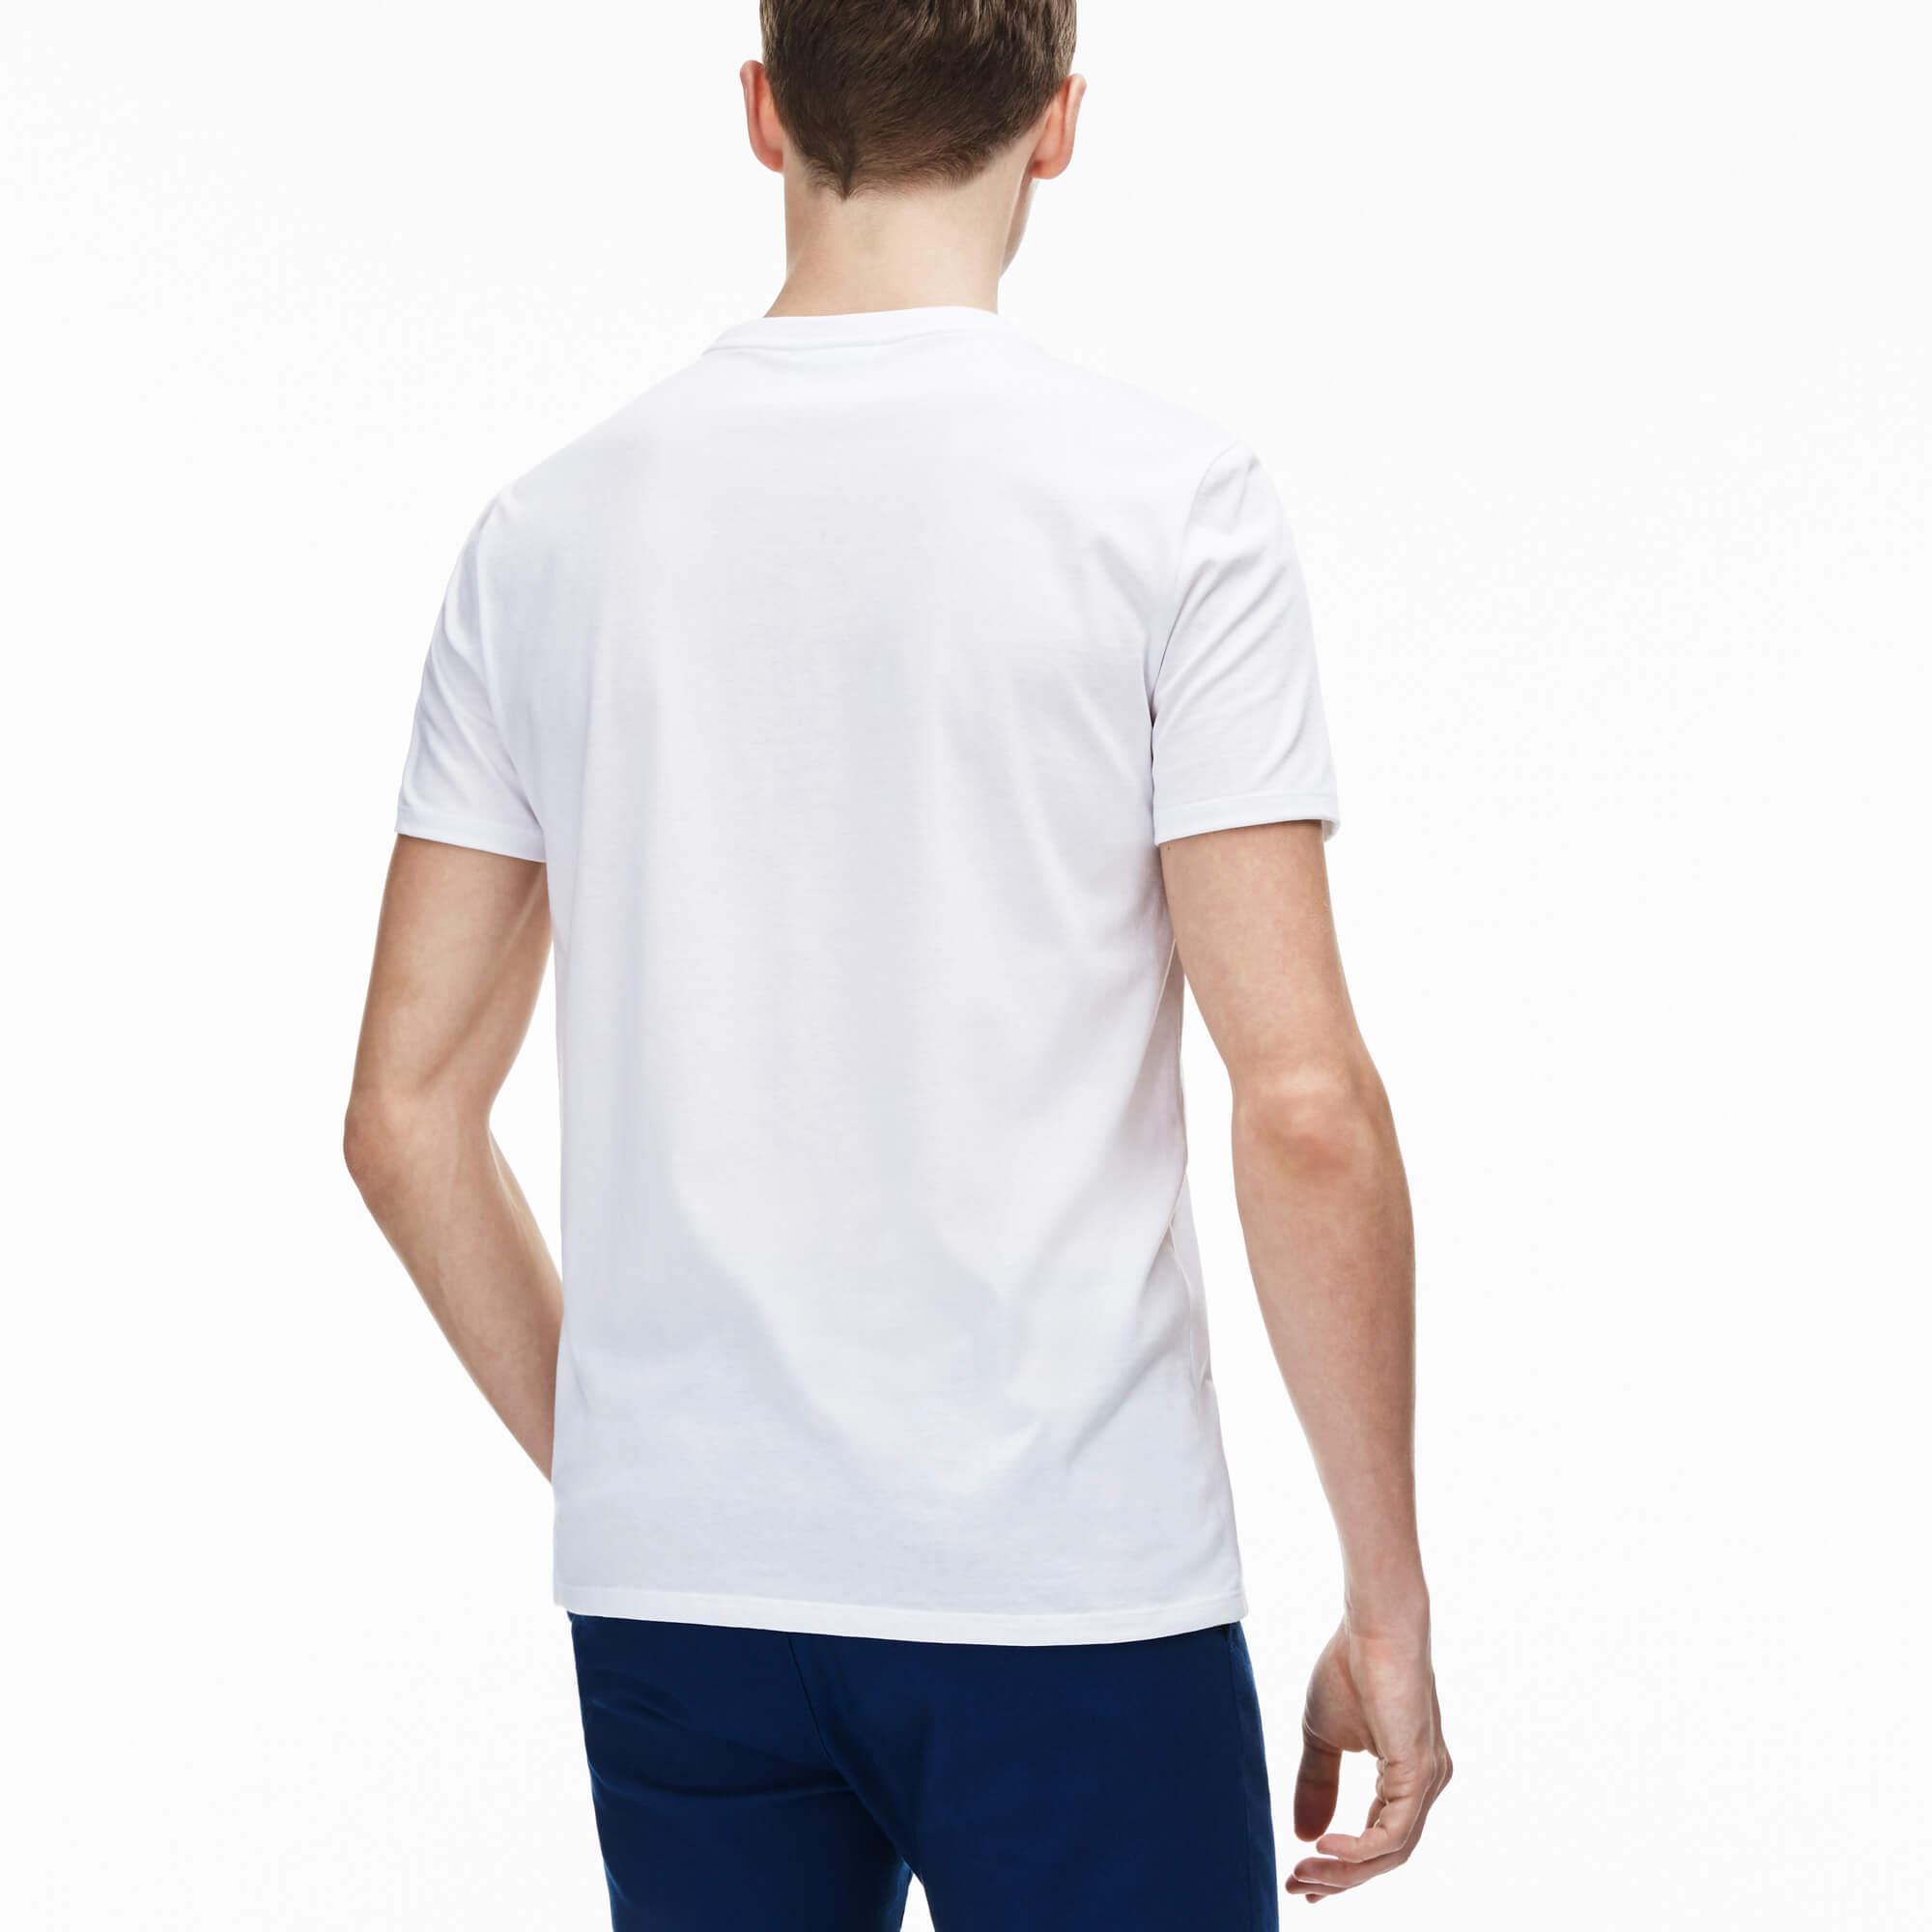 Lacoste Erkek Beyaz T-Shirt